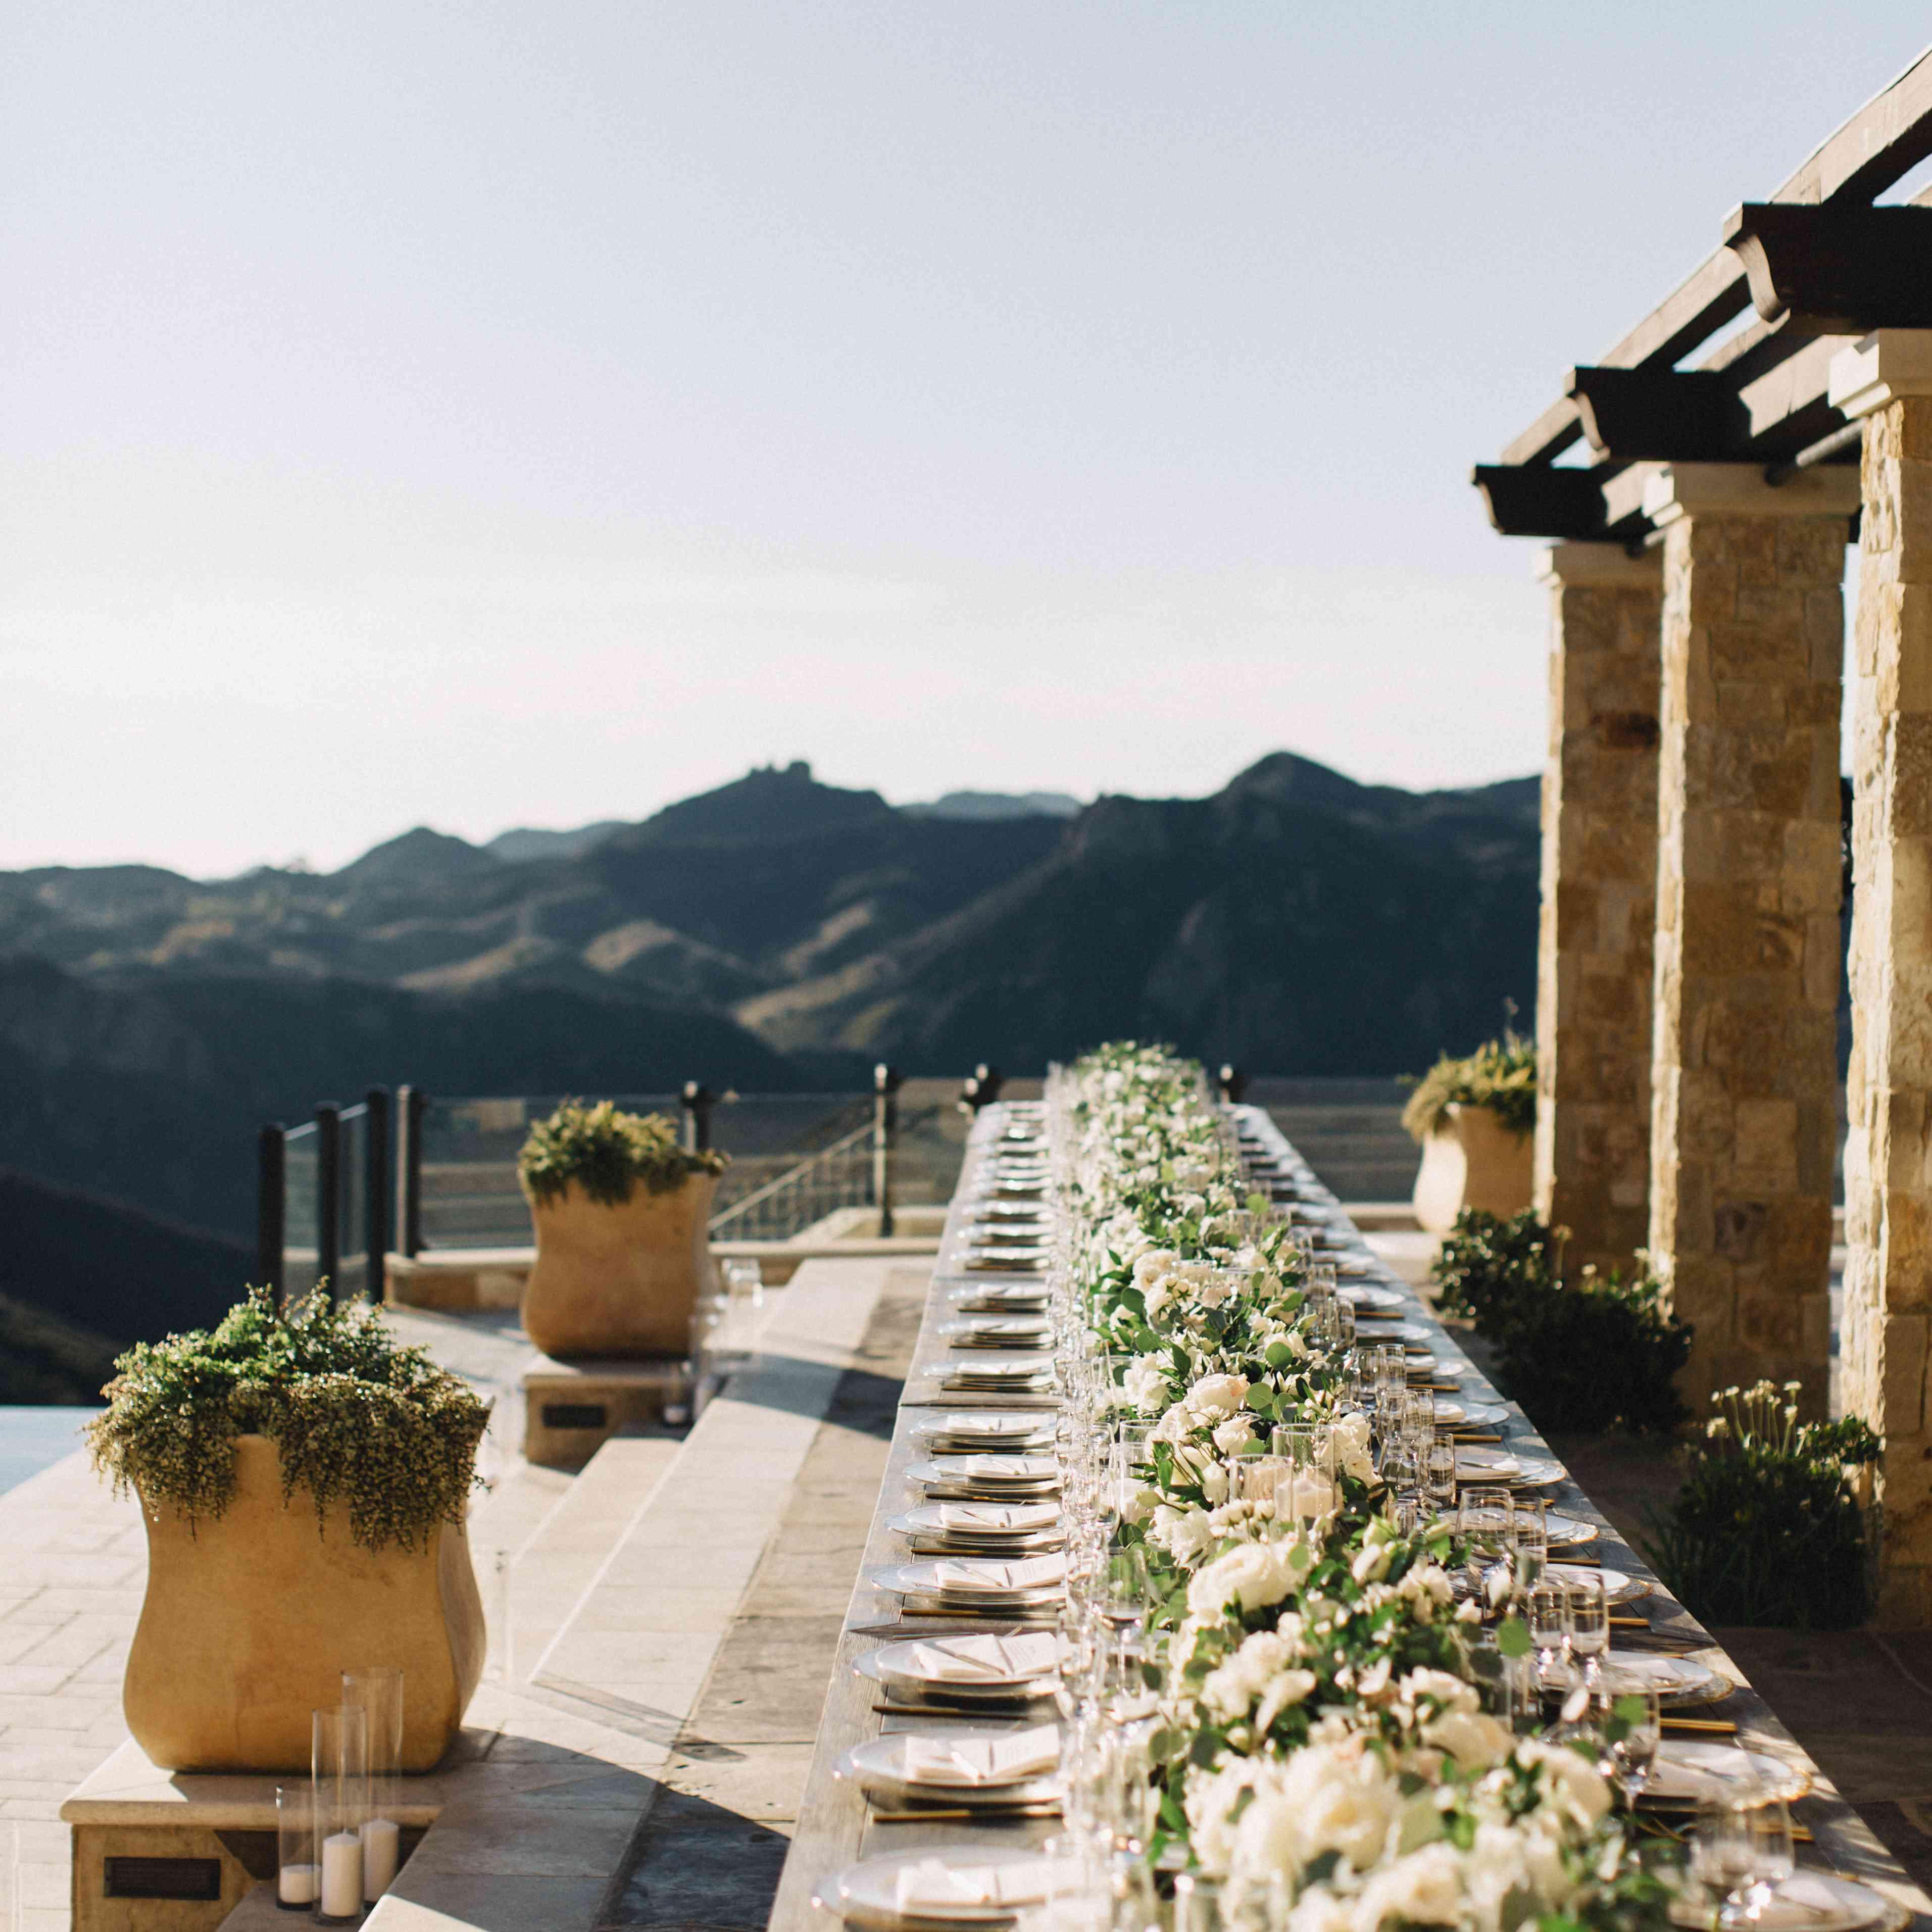 Alfresco wedding reception dinner set-up